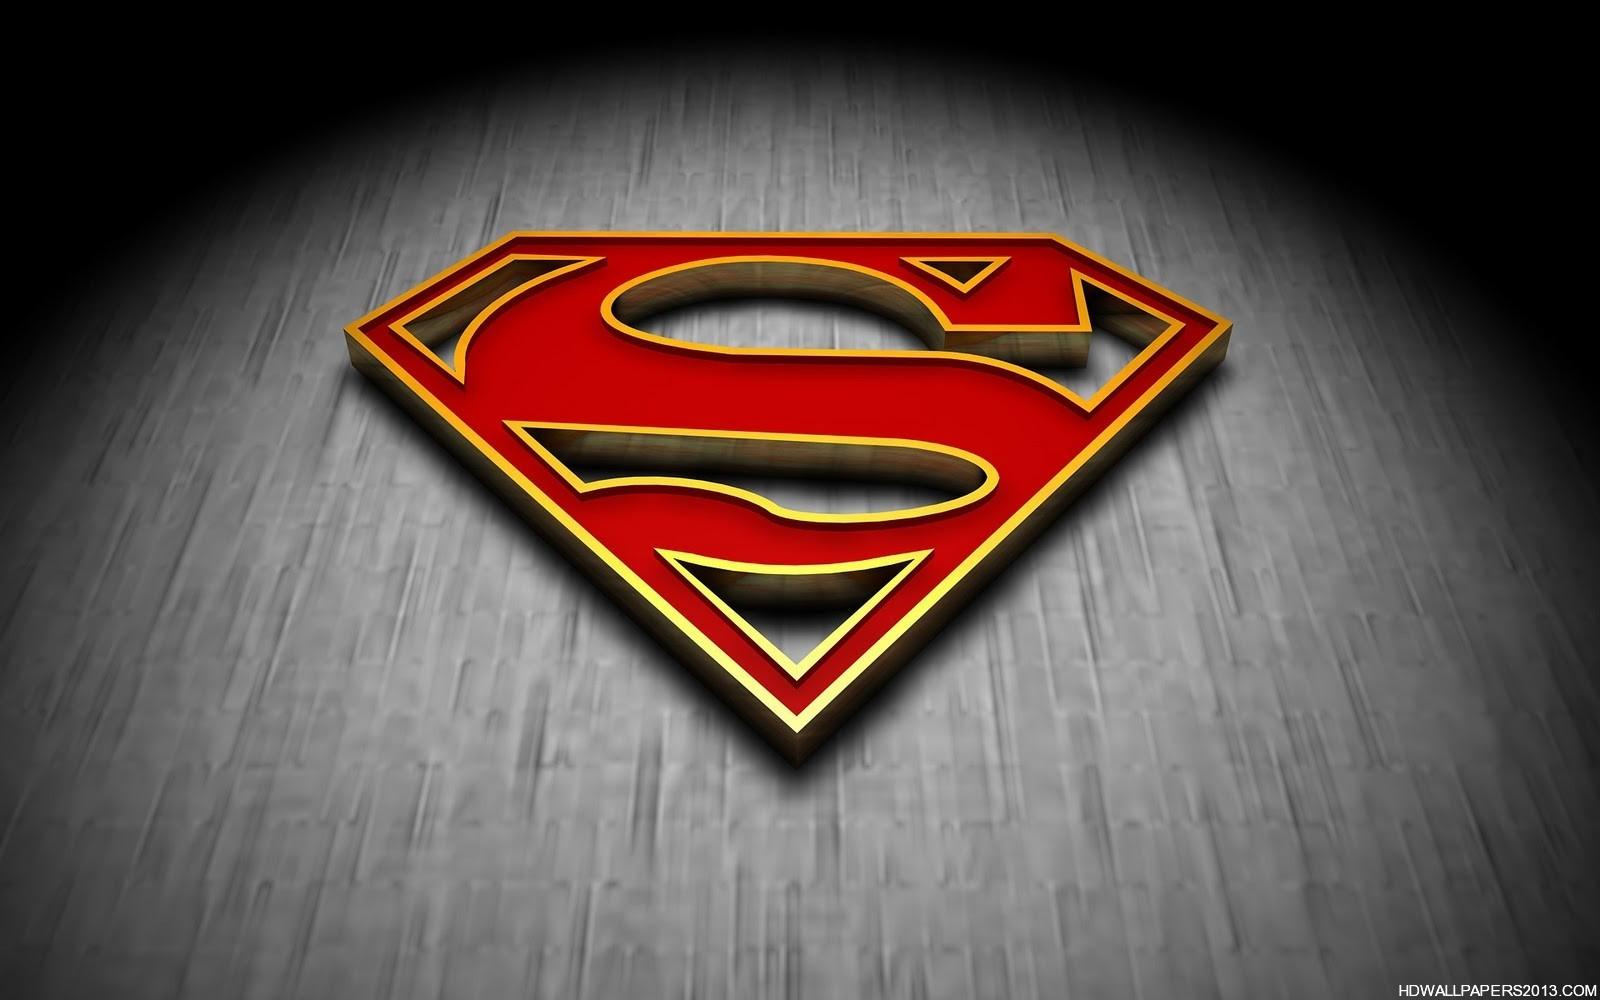 Super man logo hd wallpaper wide screen wallpaper 1080p2k4k super man logo hd wallpaper thecheapjerseys Choice Image